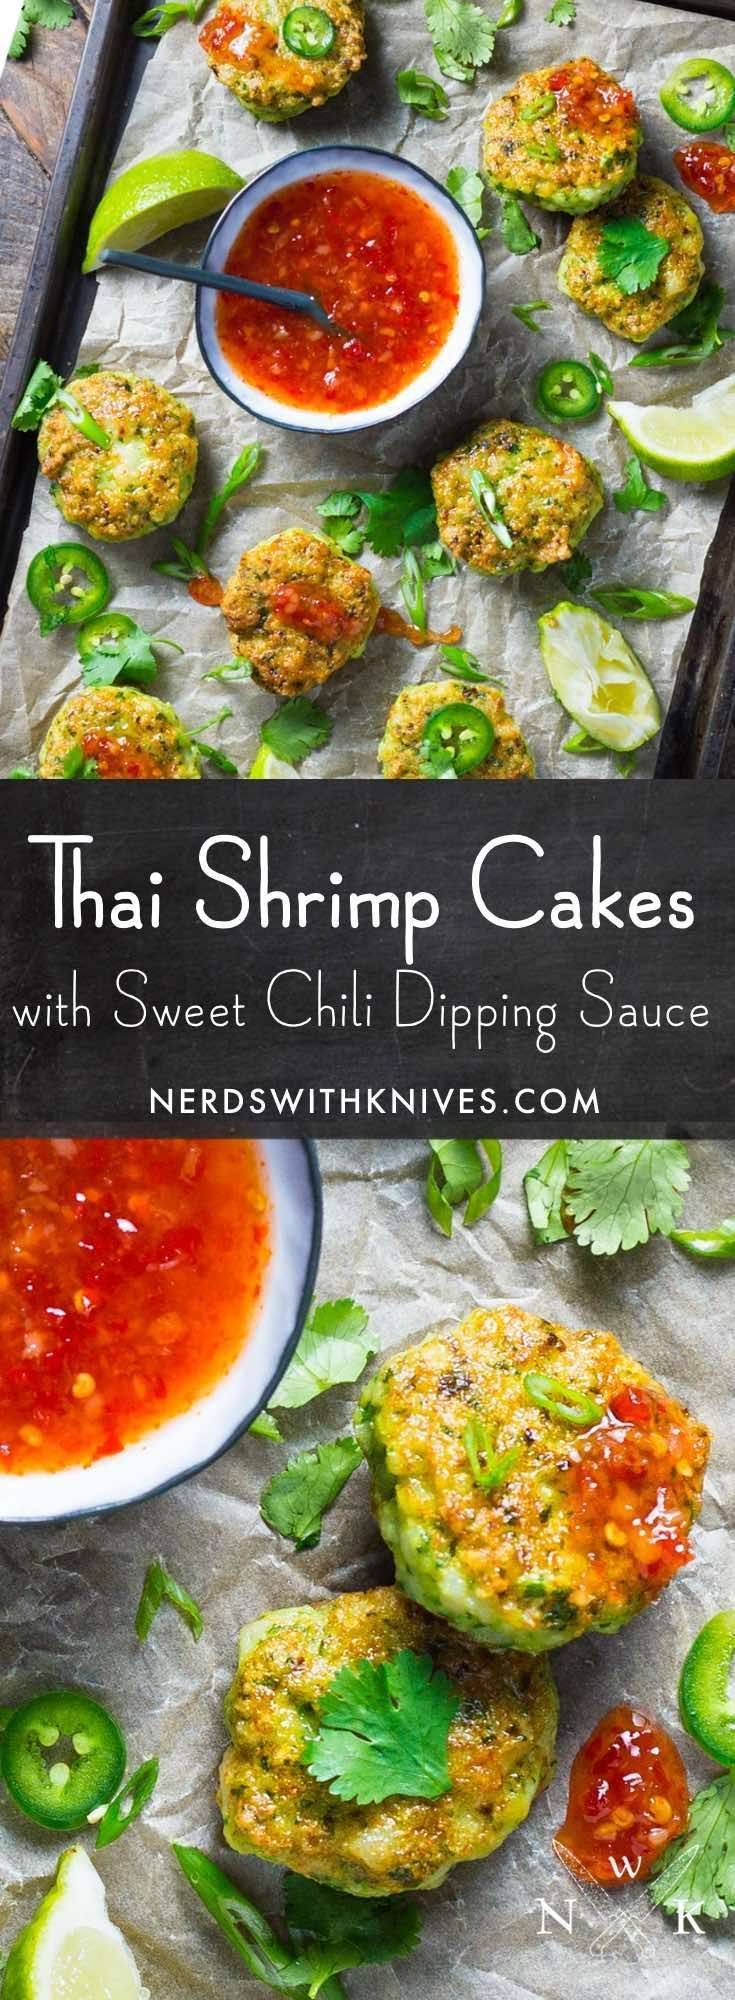 Mini Thai Shrimp Cakes with Sweet Chili Dipping Sauce